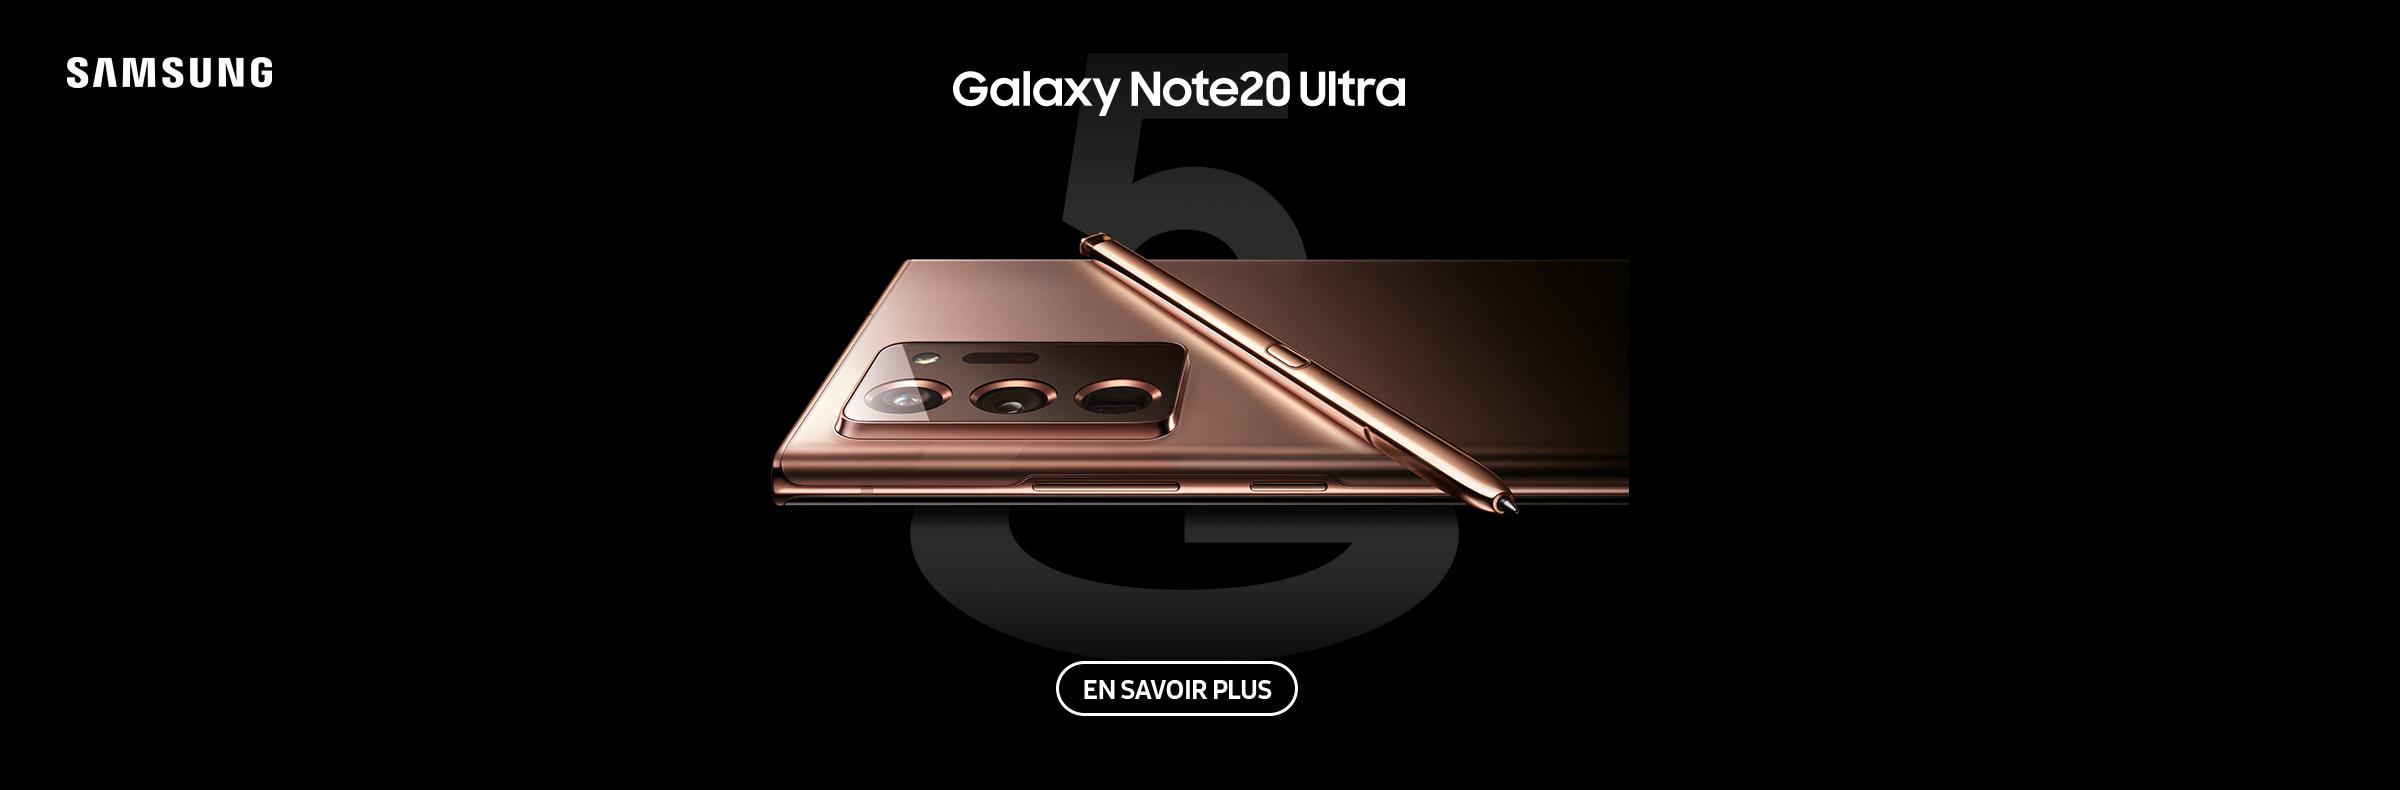 Samsung Galaxy Note20 Ultra Maintenant disponible